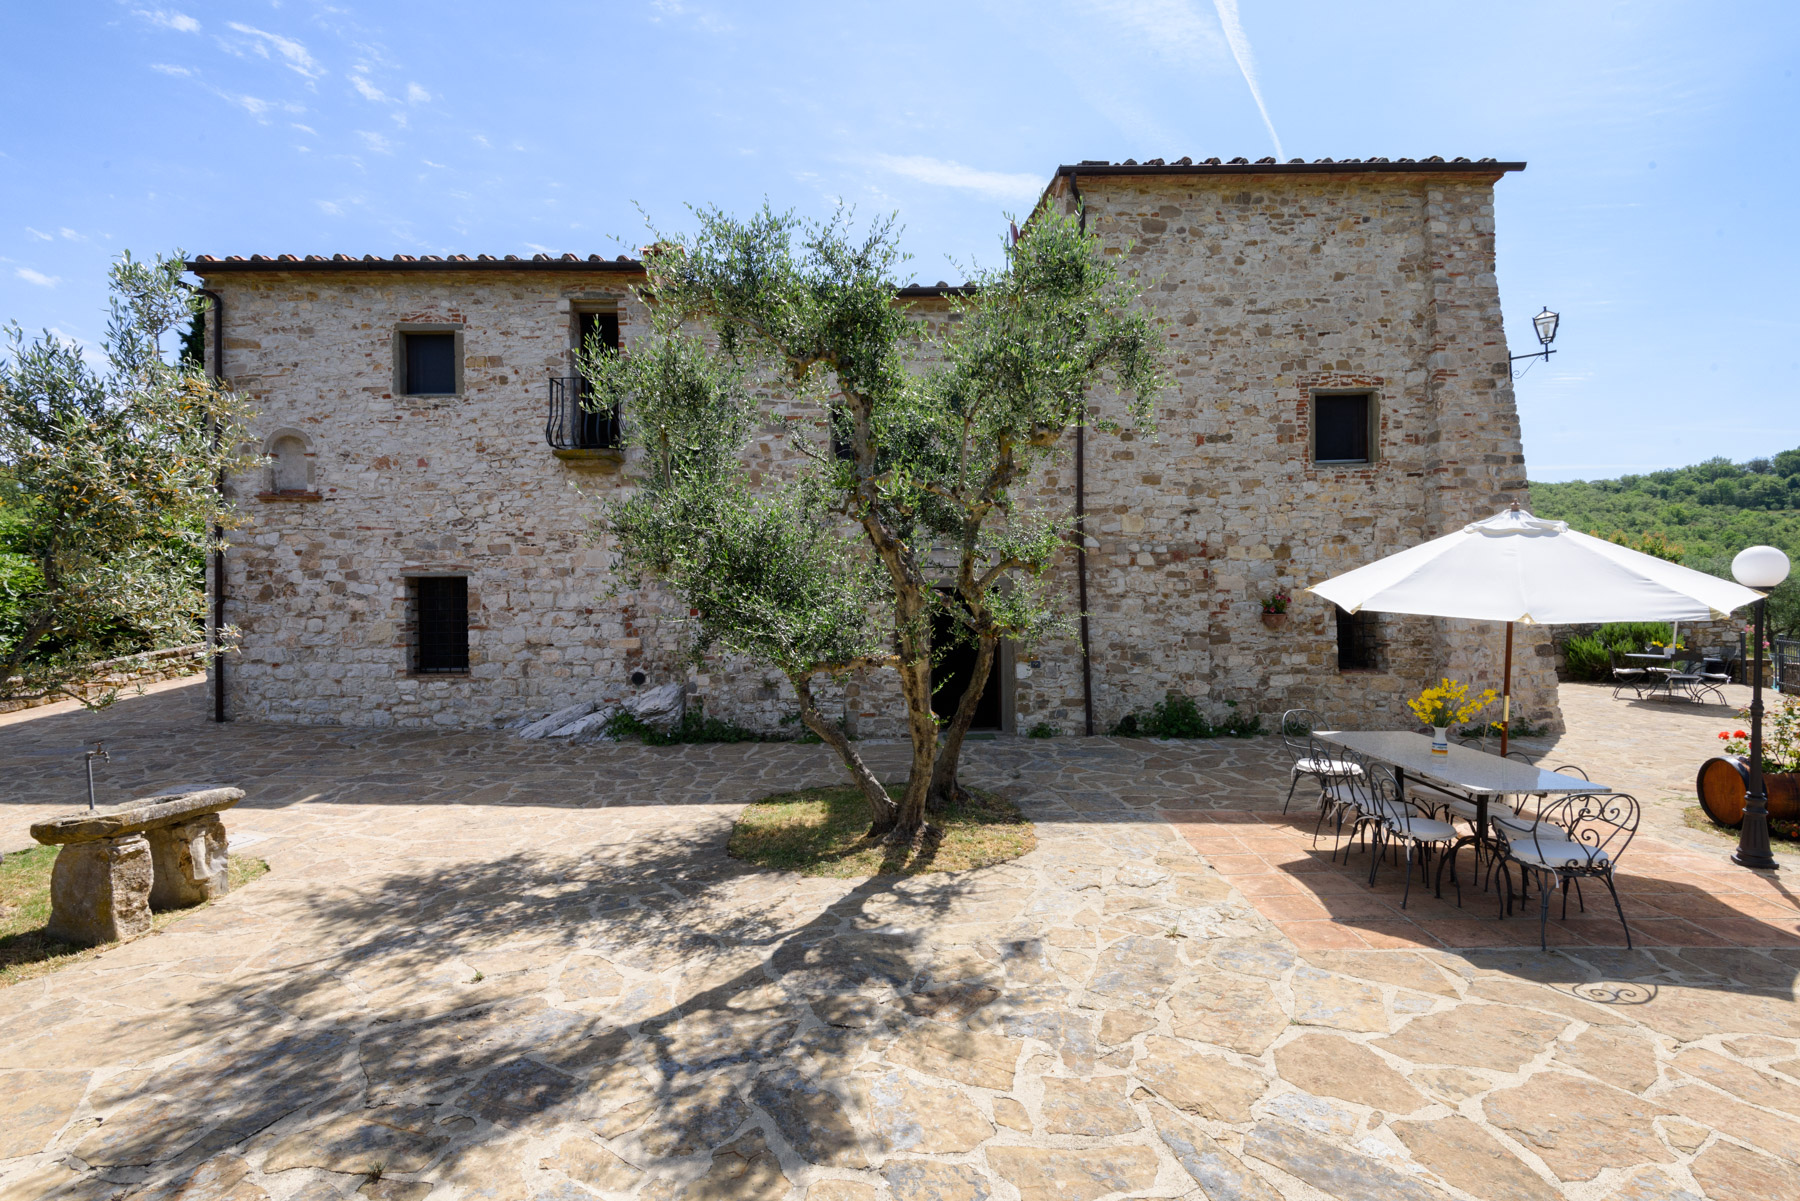 Rustico in Vendita a Castellina In Chianti: 5 locali, 650 mq - Foto 7